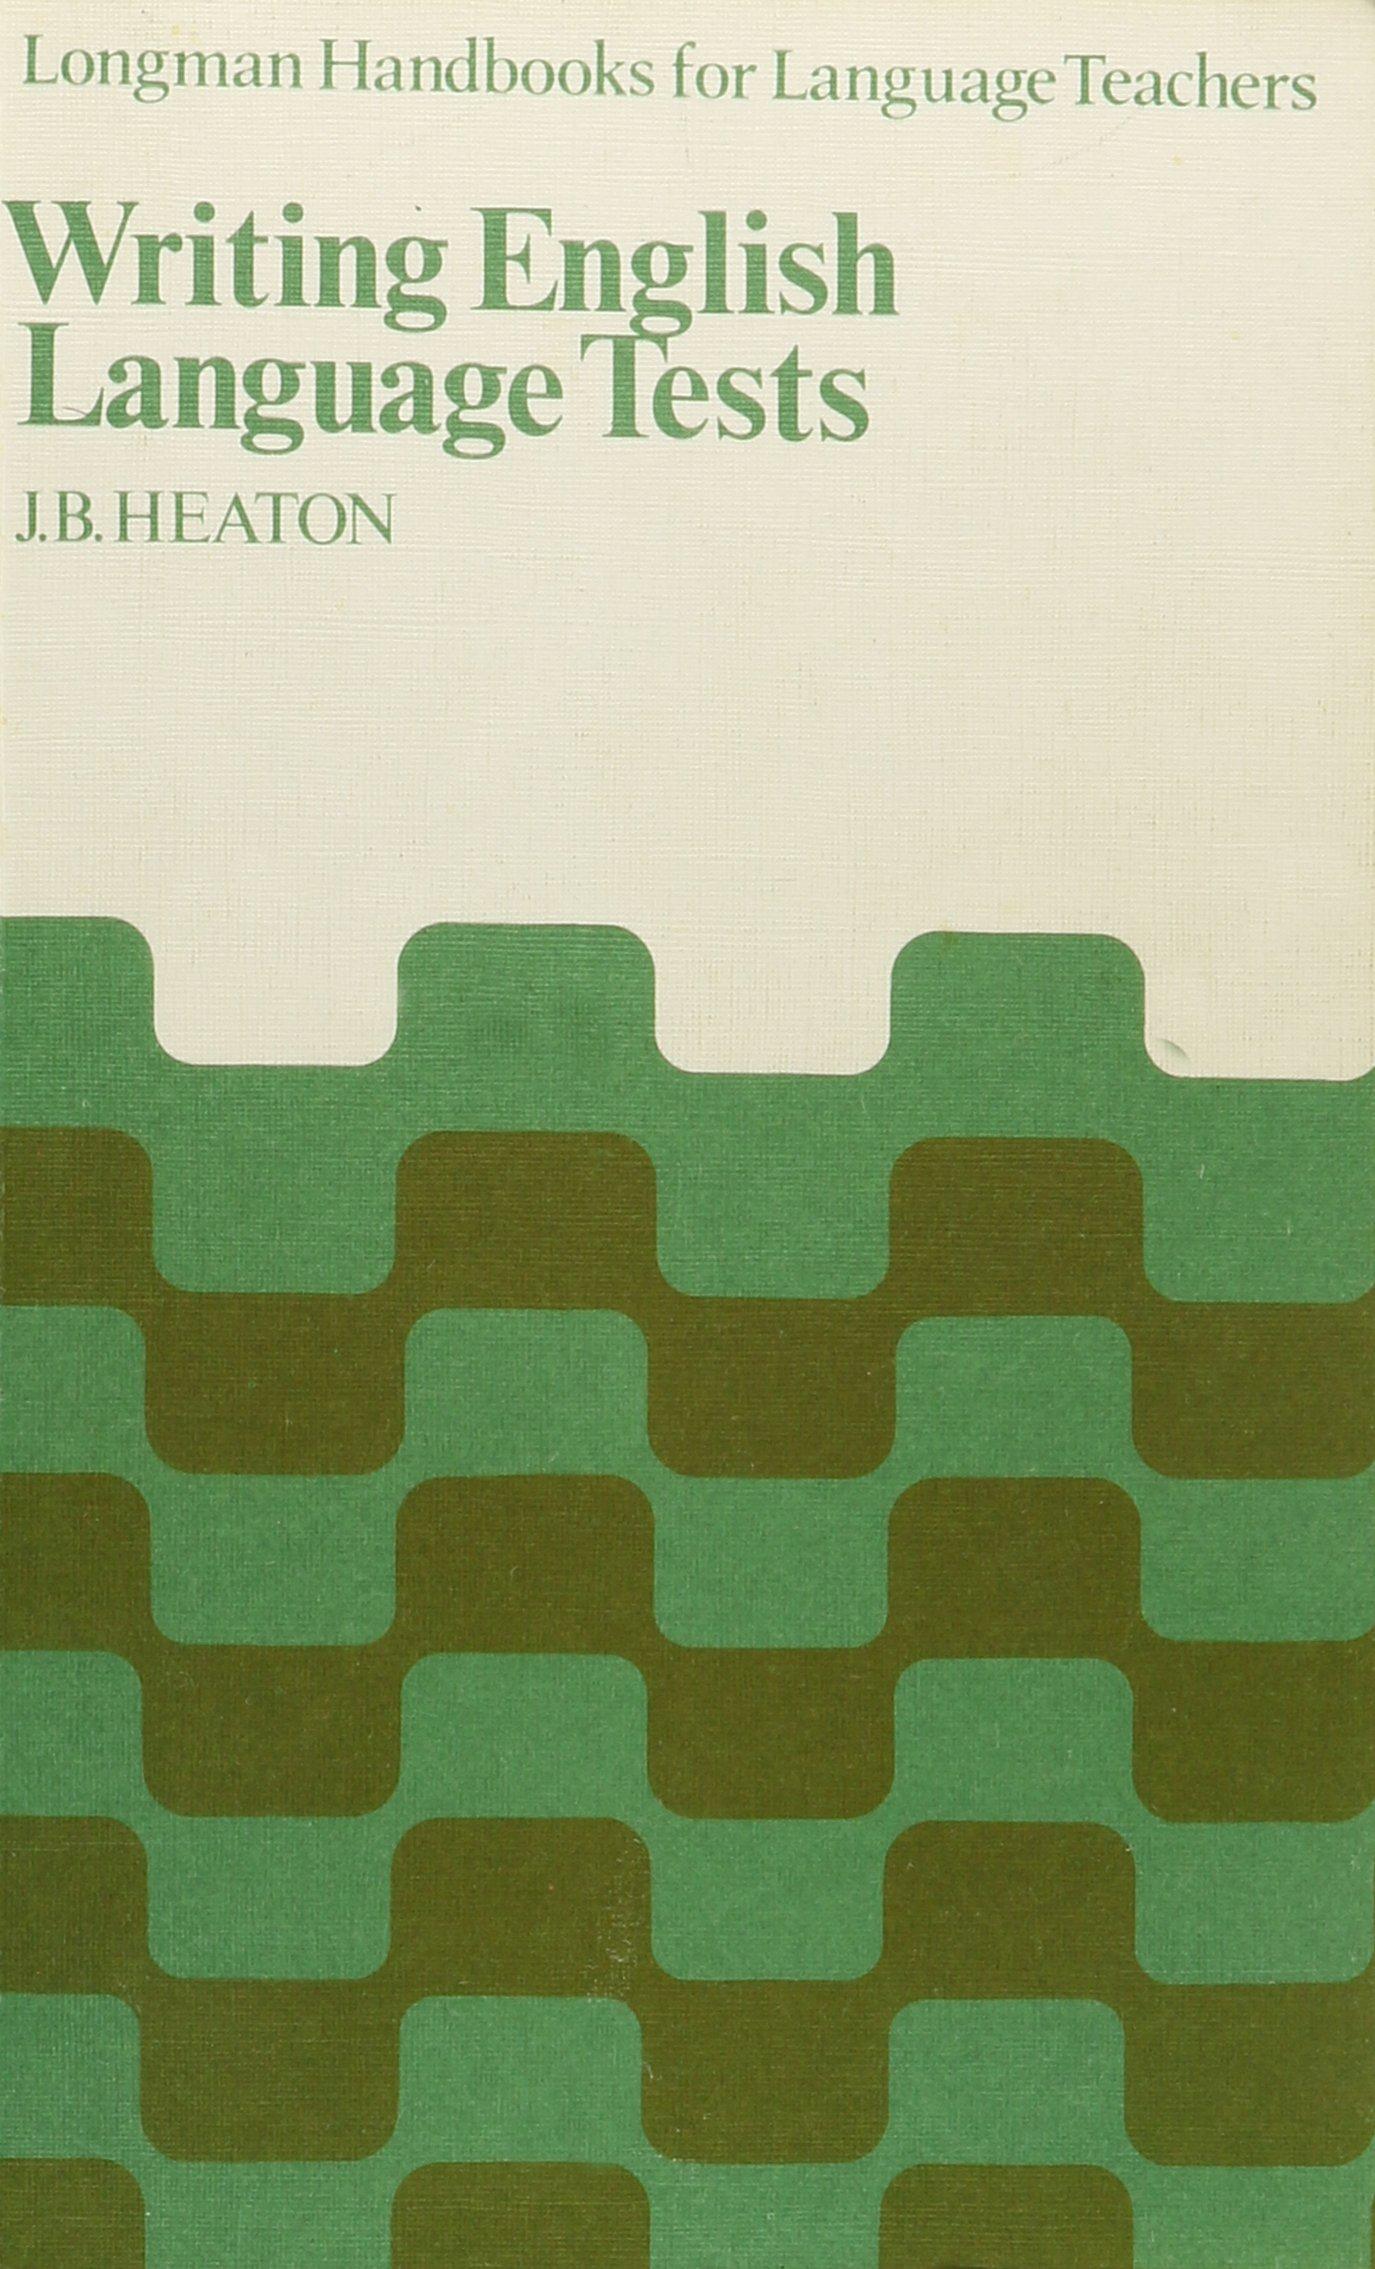 Writing English Language Tests (Longman Handbooks for Language Teachers):  Amazon.co.uk: J.B. Heaton: 9780582550803: Books